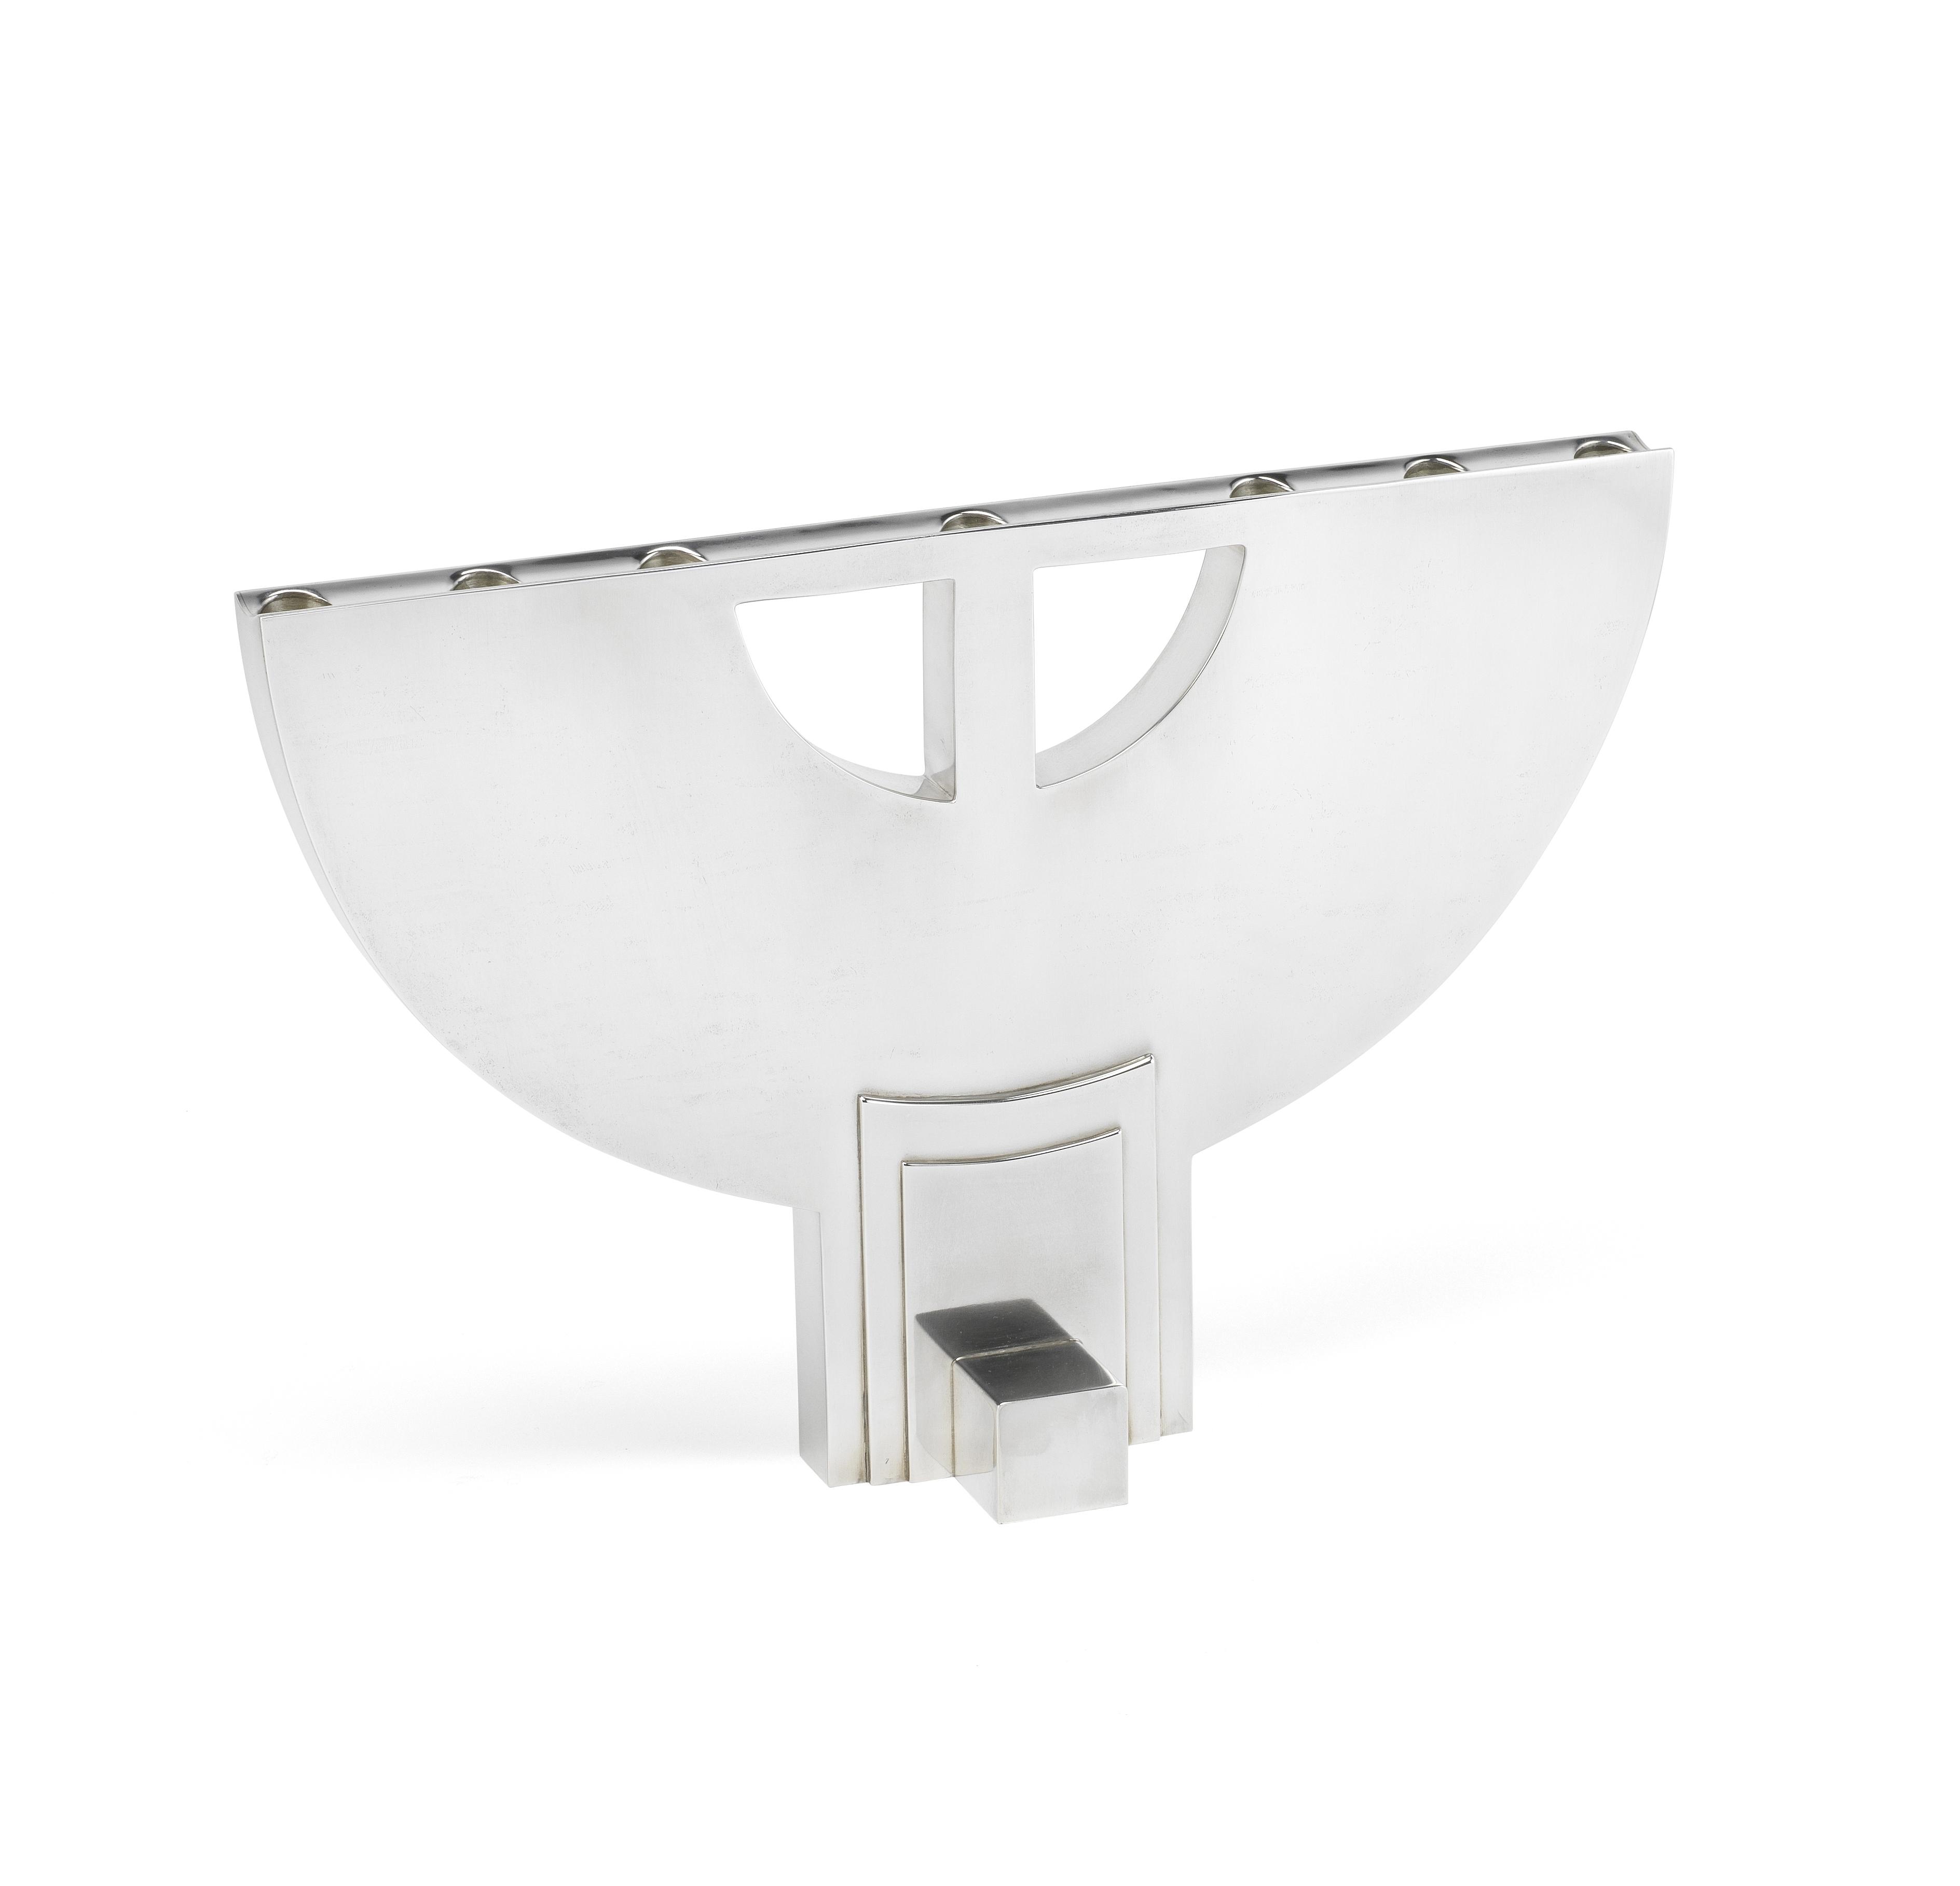 An Italian silver menorah / candelabrum Cleto Munari, designed by Hans Hollein, 1979, underside s...